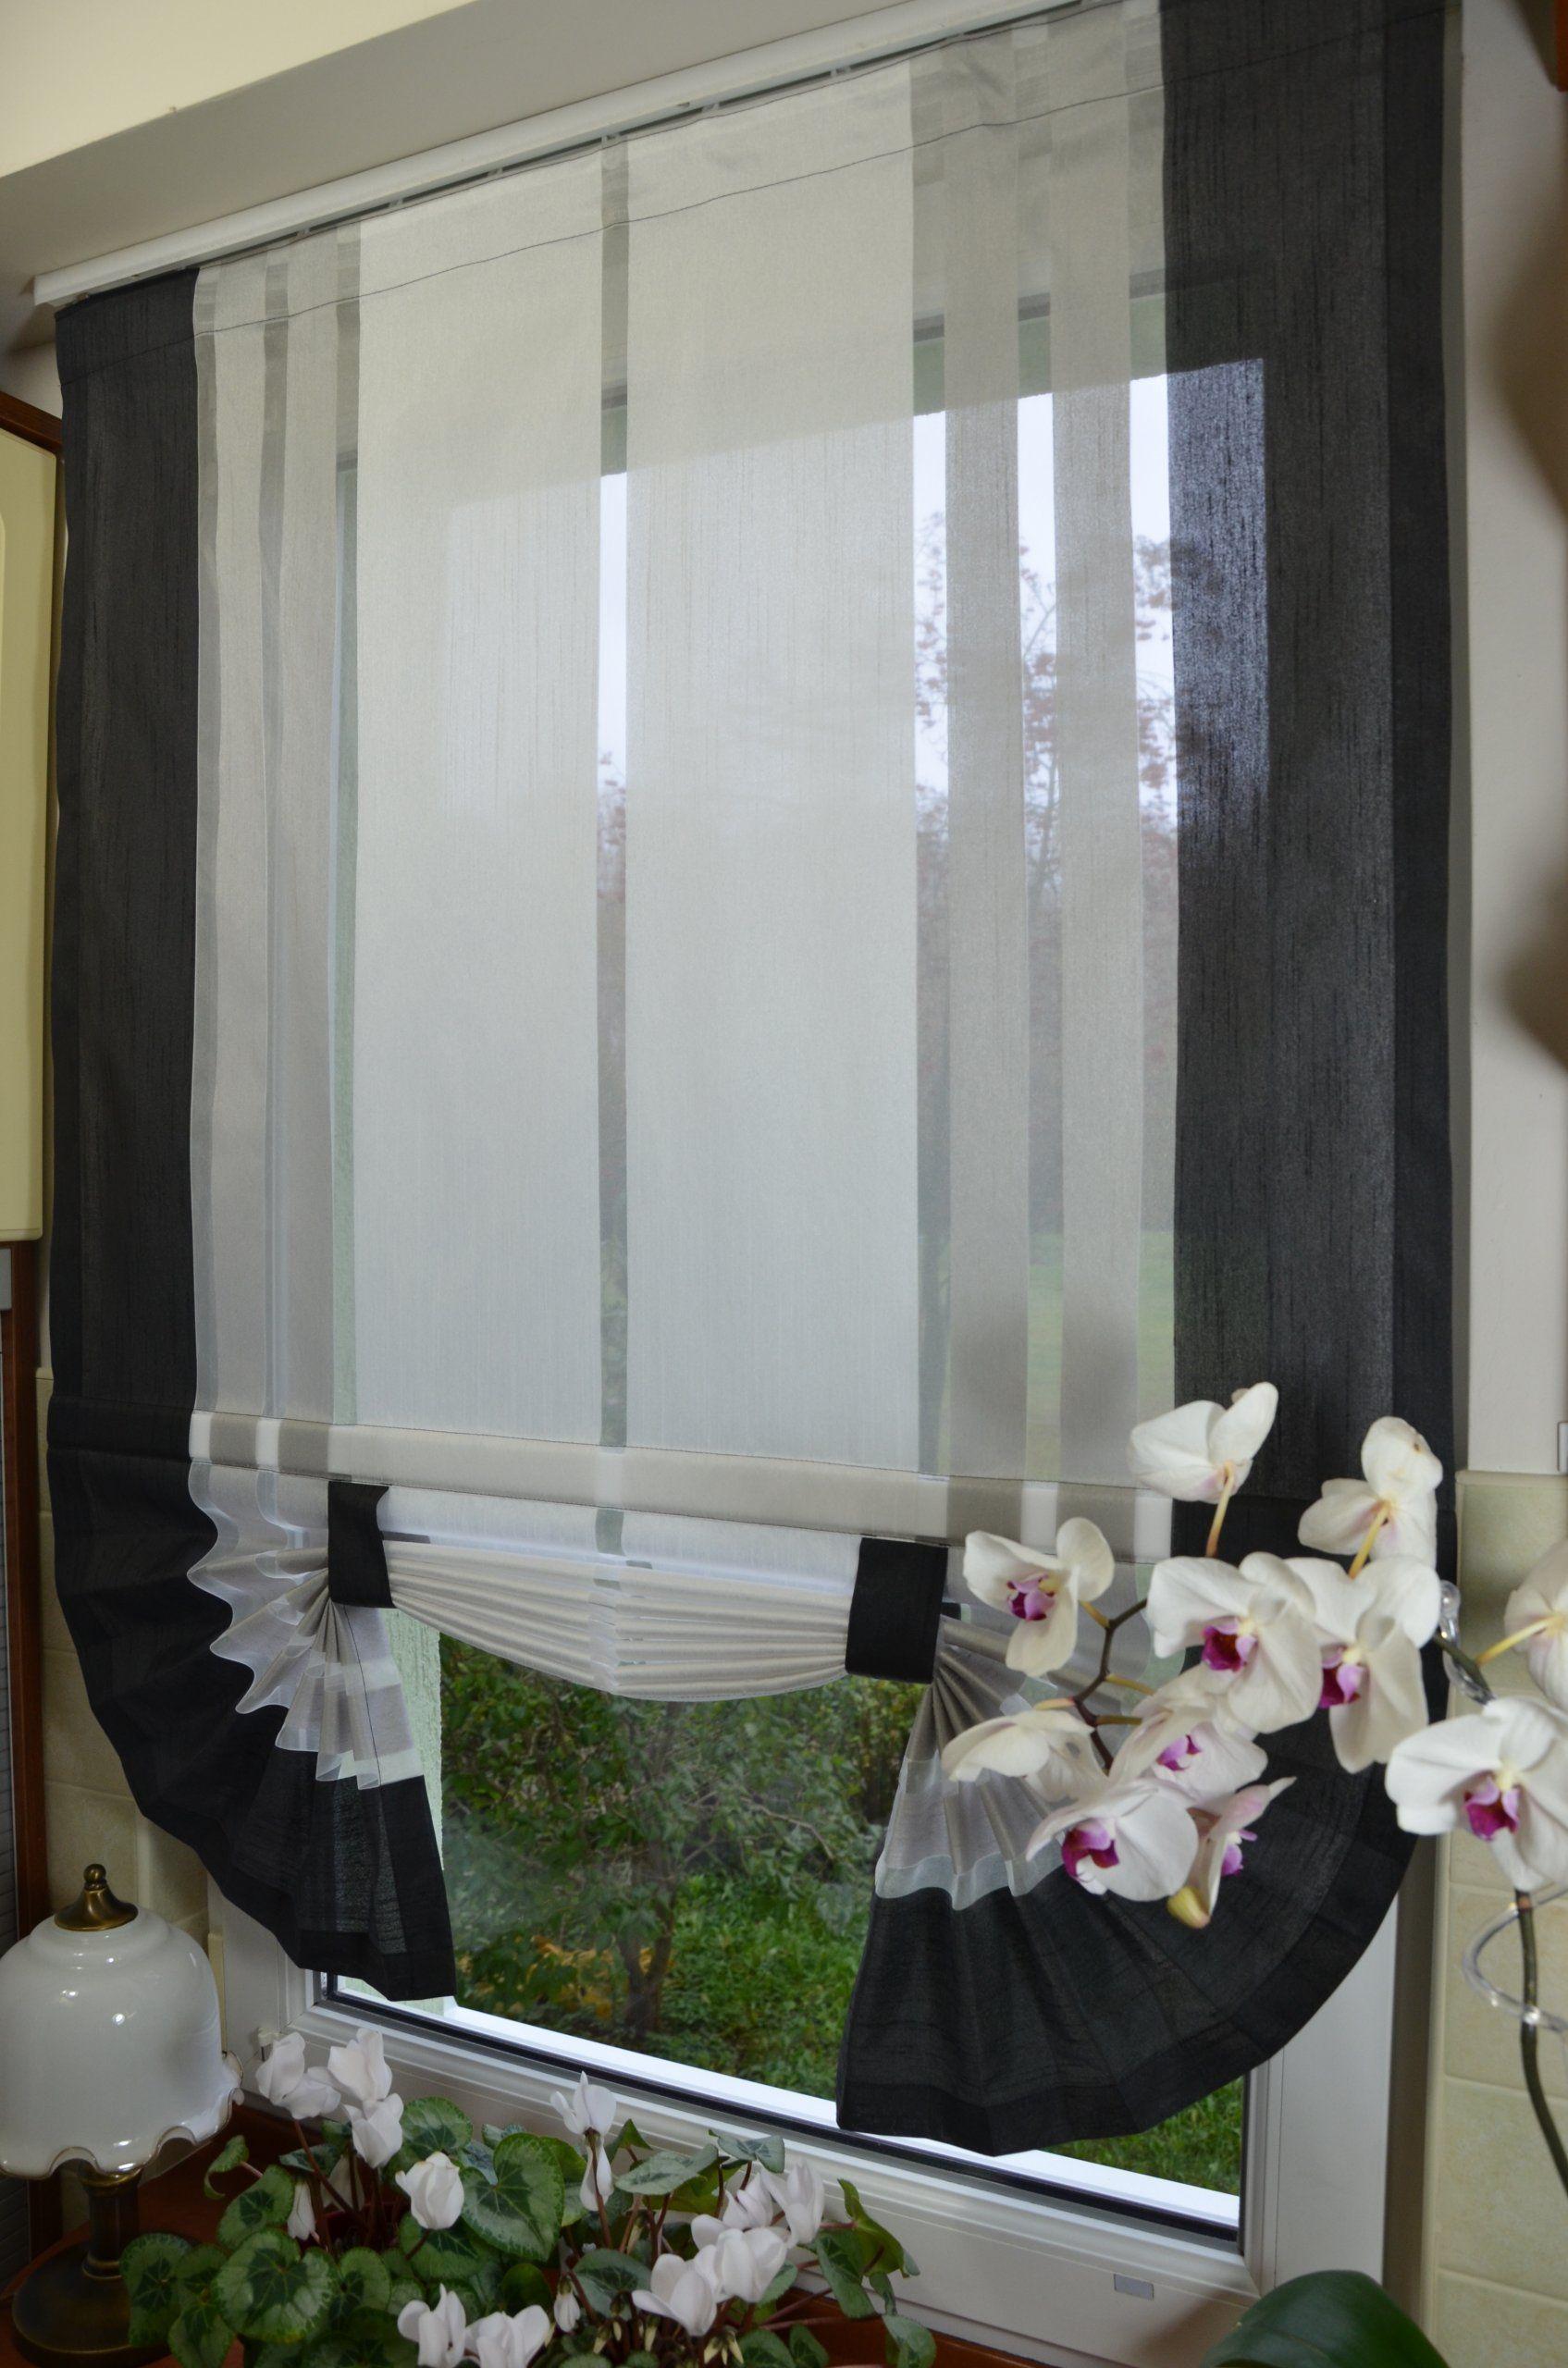 Producent Firanki Panele Zasłony Firany Do Salonu Okna In